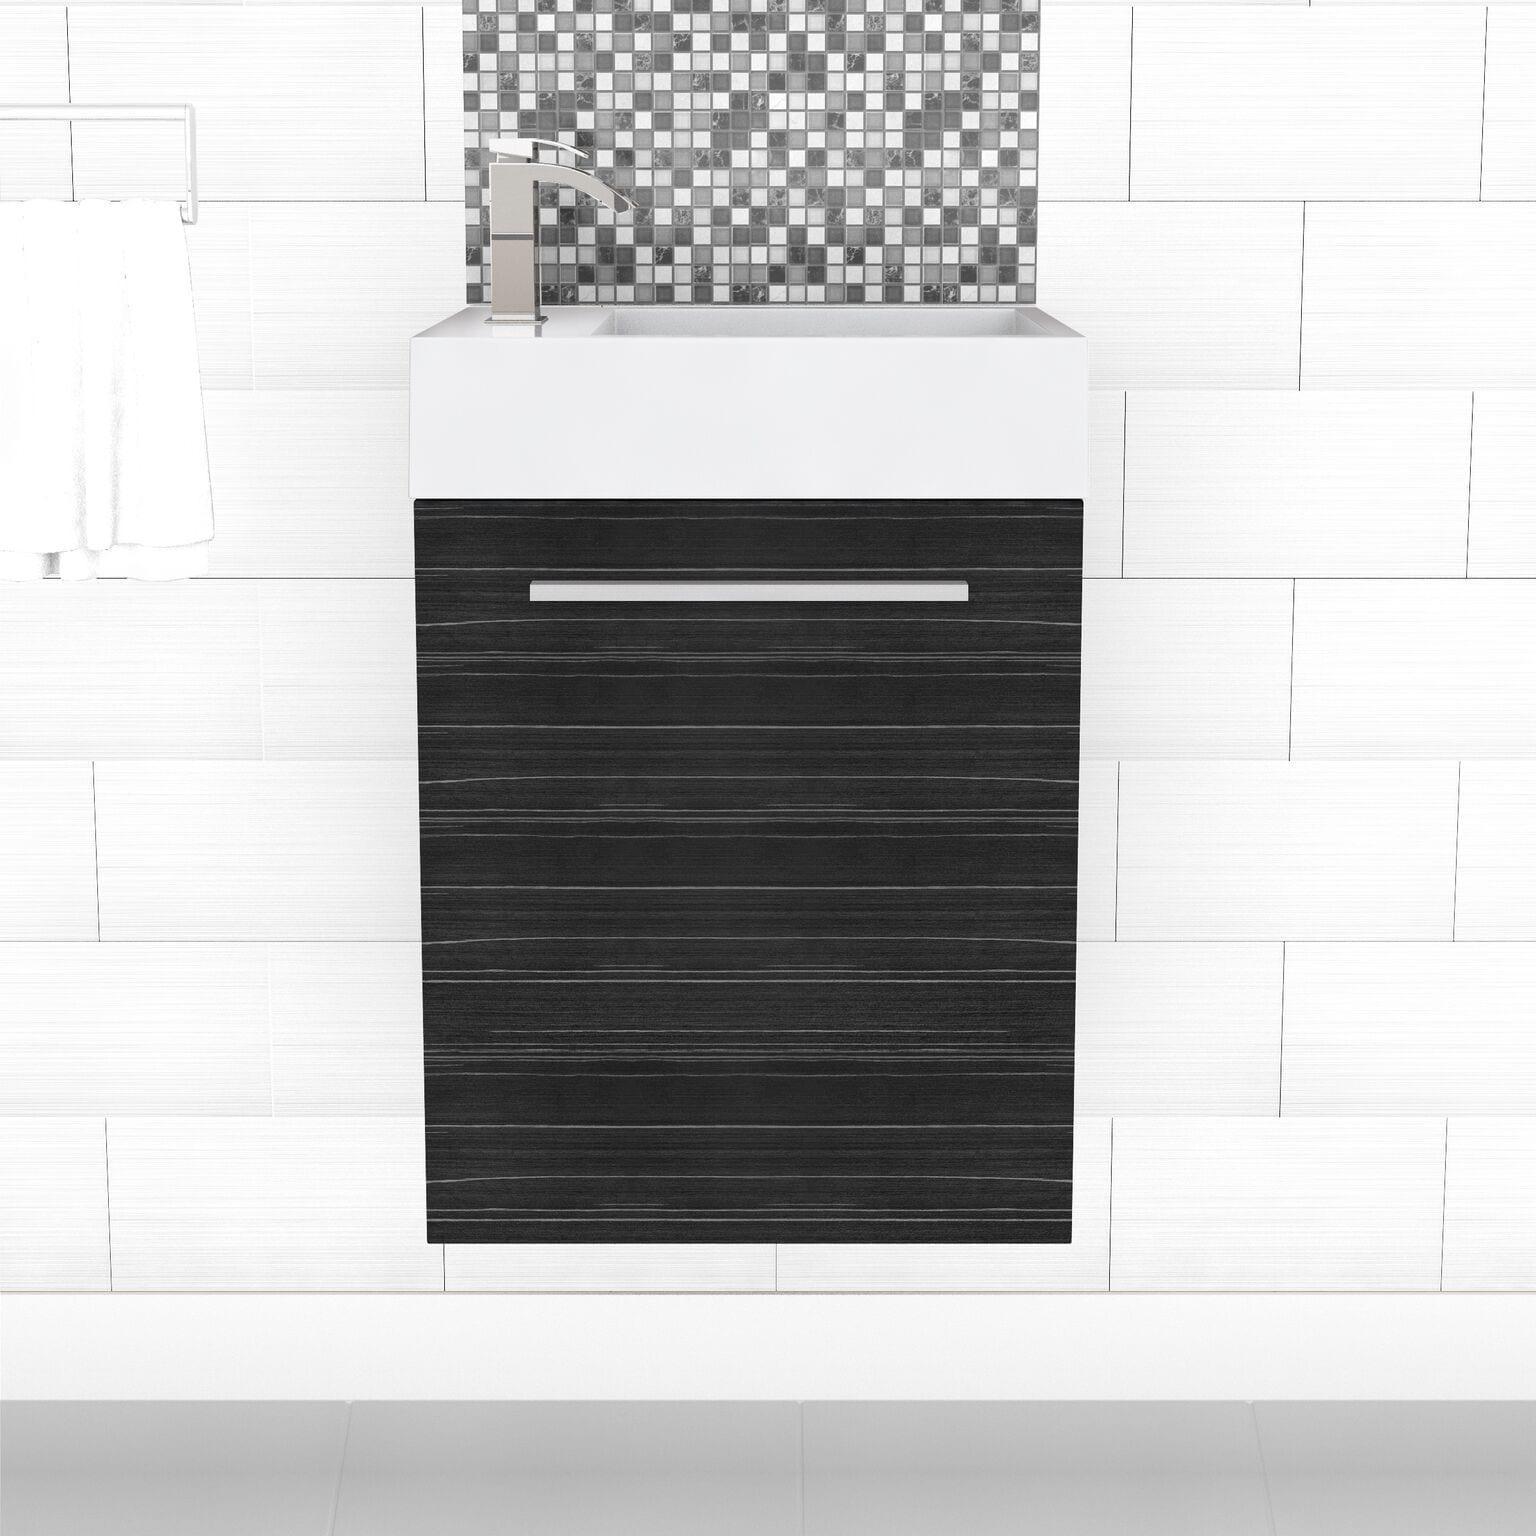 vanity cabinets inch sink classic vanities set bathroom double cutler buy kitchen bath by furniture